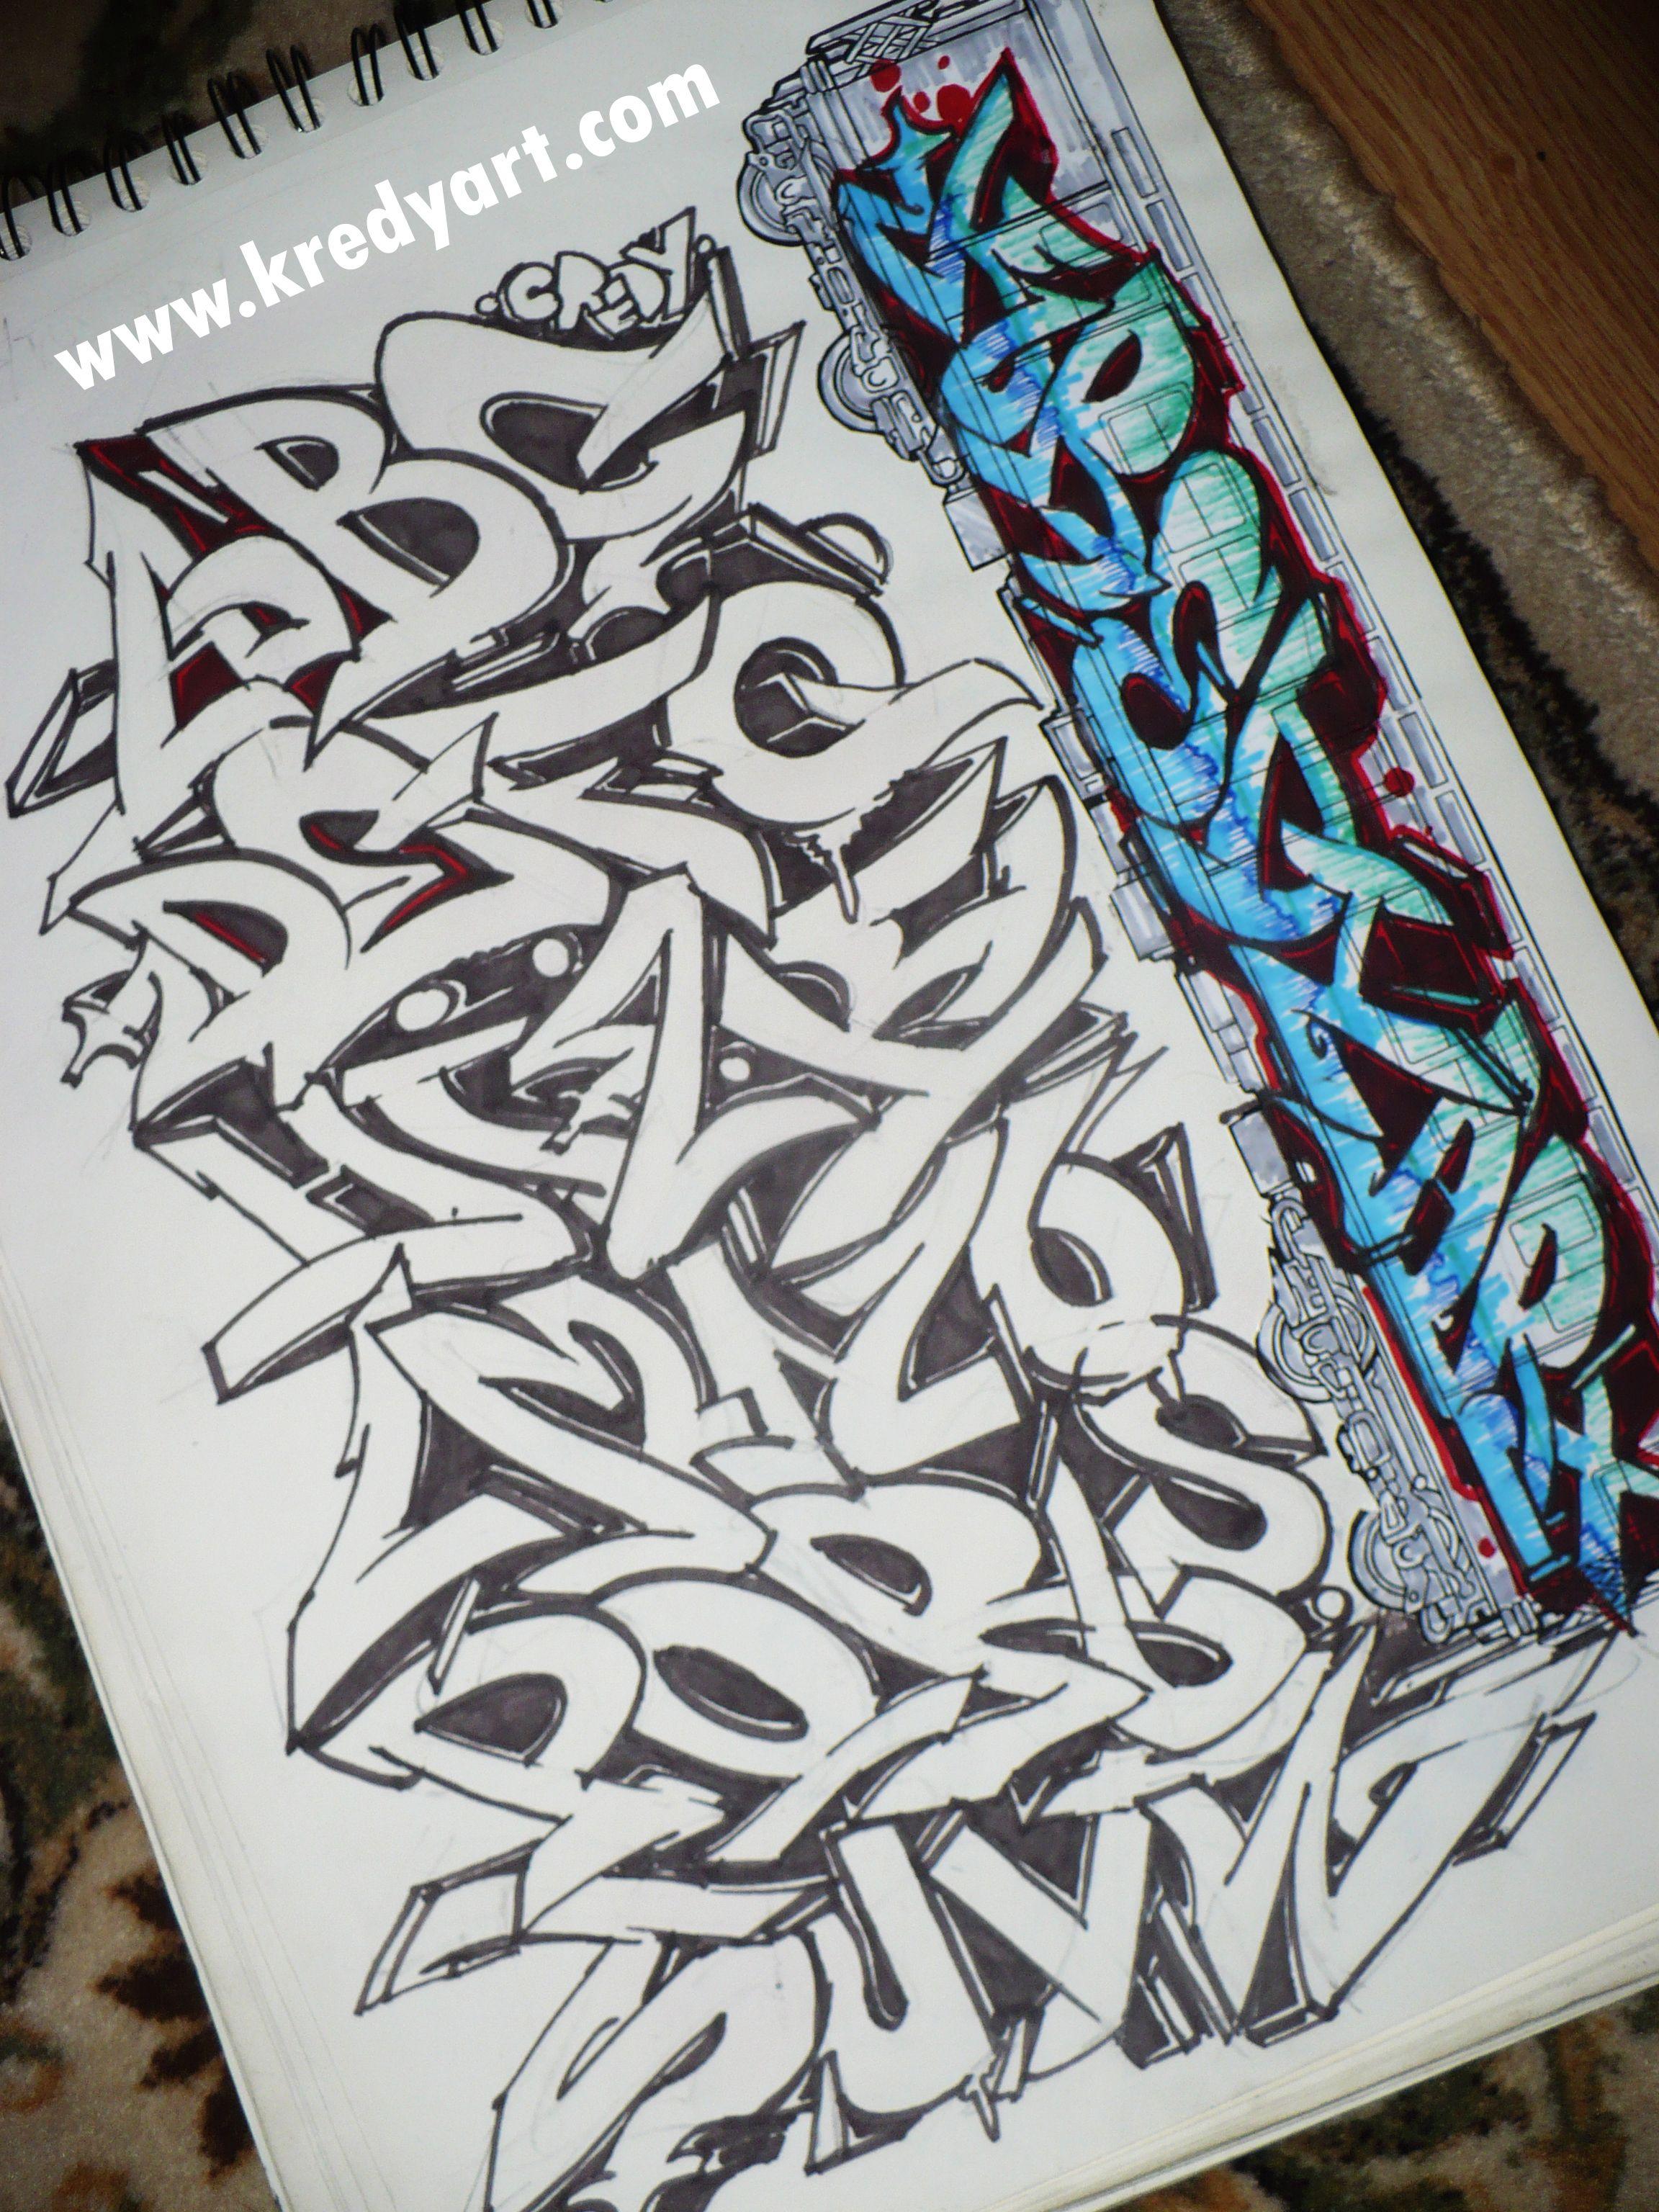 graffiti alphabet tattoo fonts graffiti schrift graffiti graffiti alphabet. Black Bedroom Furniture Sets. Home Design Ideas